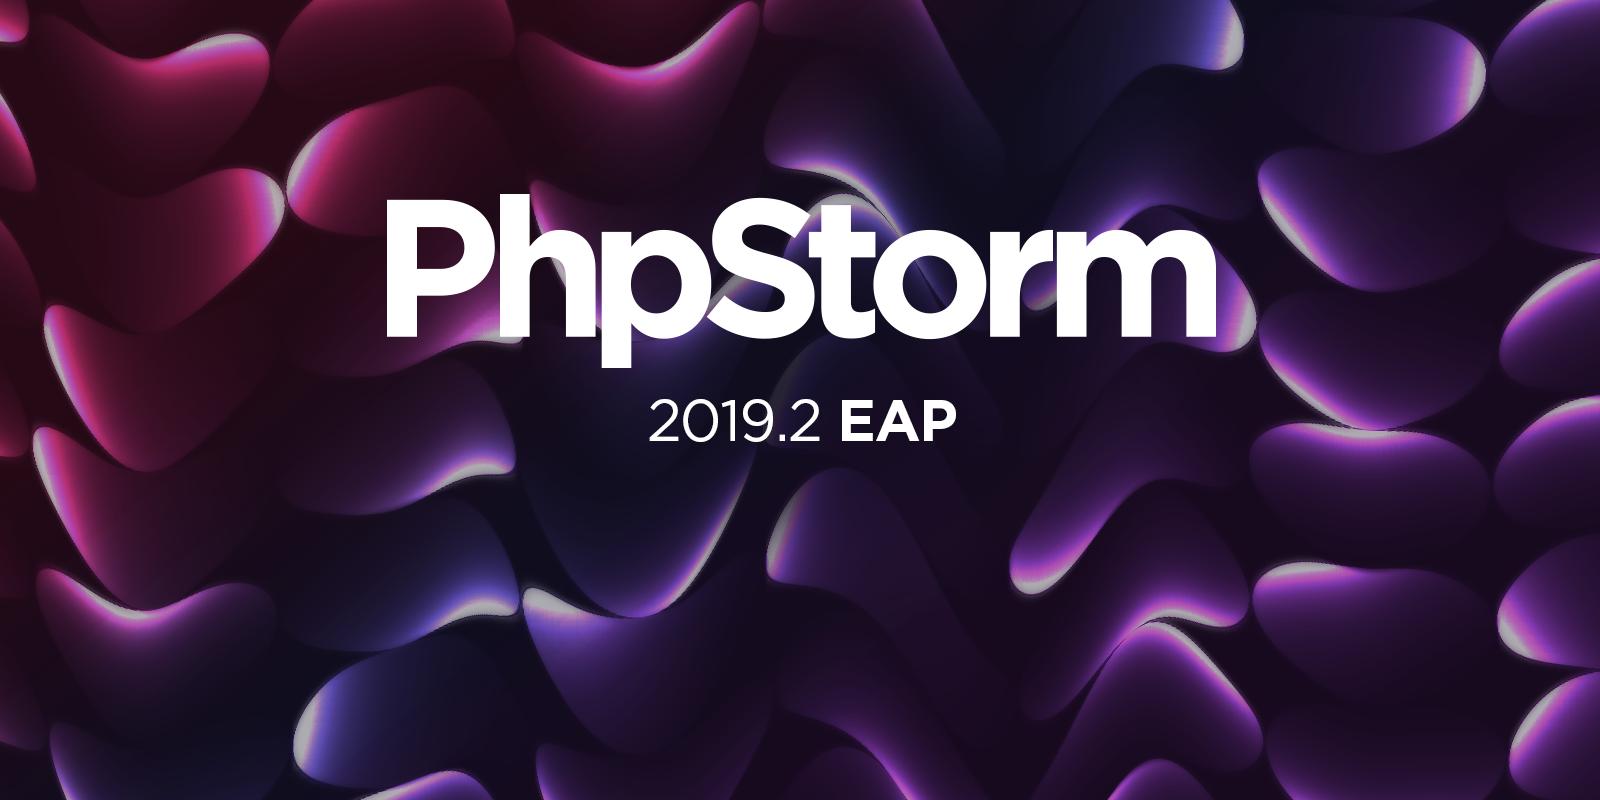 PhpStorm 2019.2 EAP